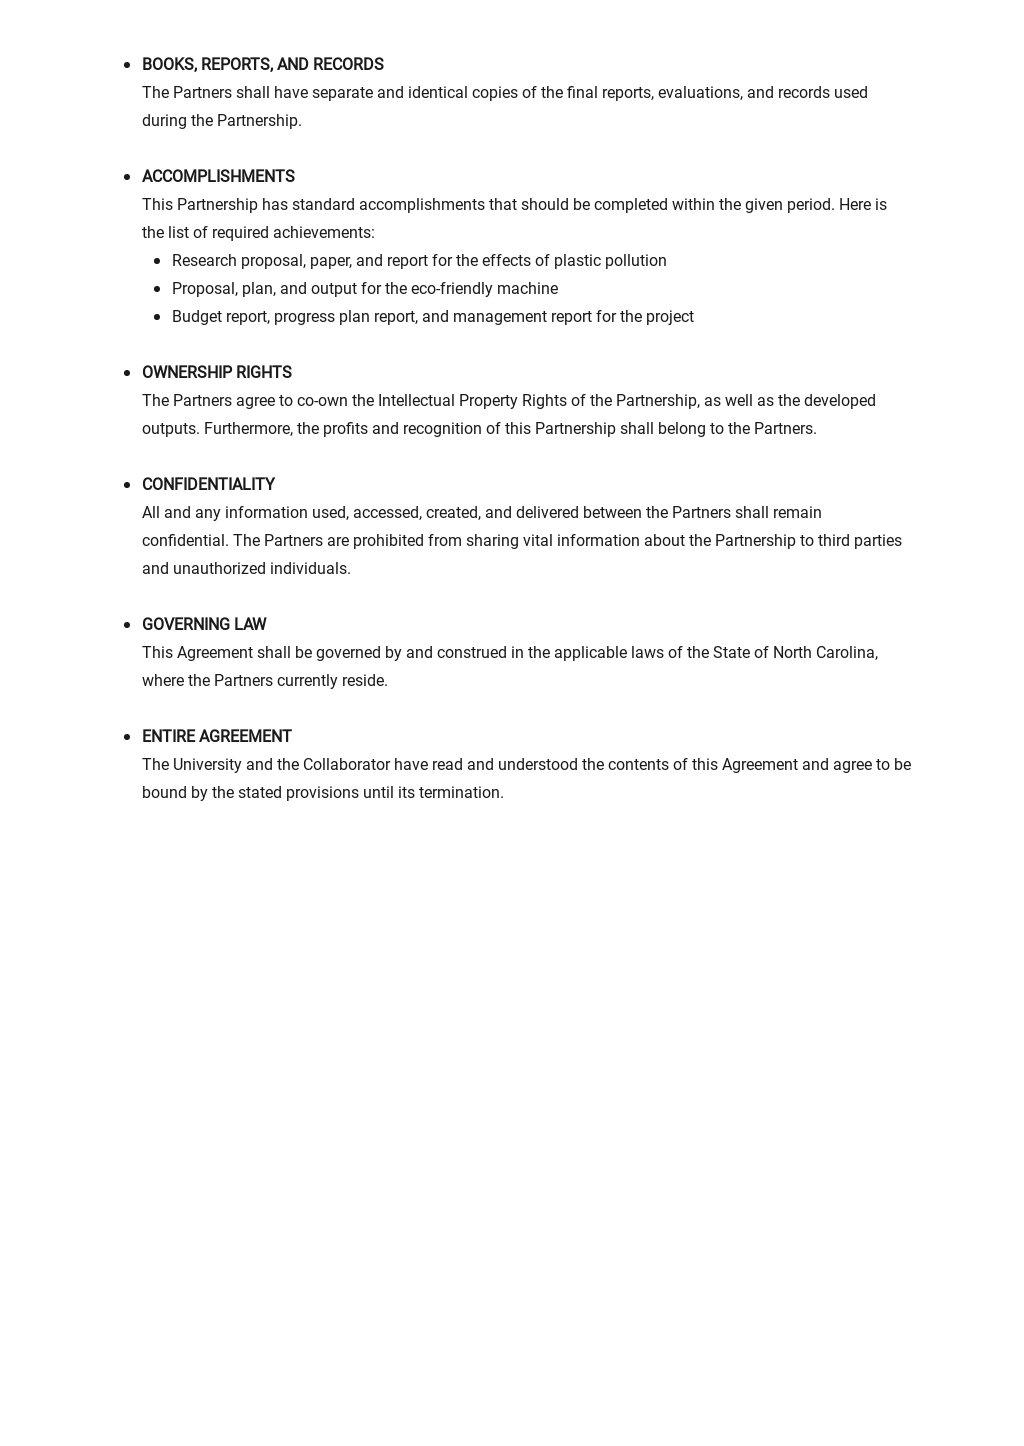 University Collaboration Agreement Template 2.jpe